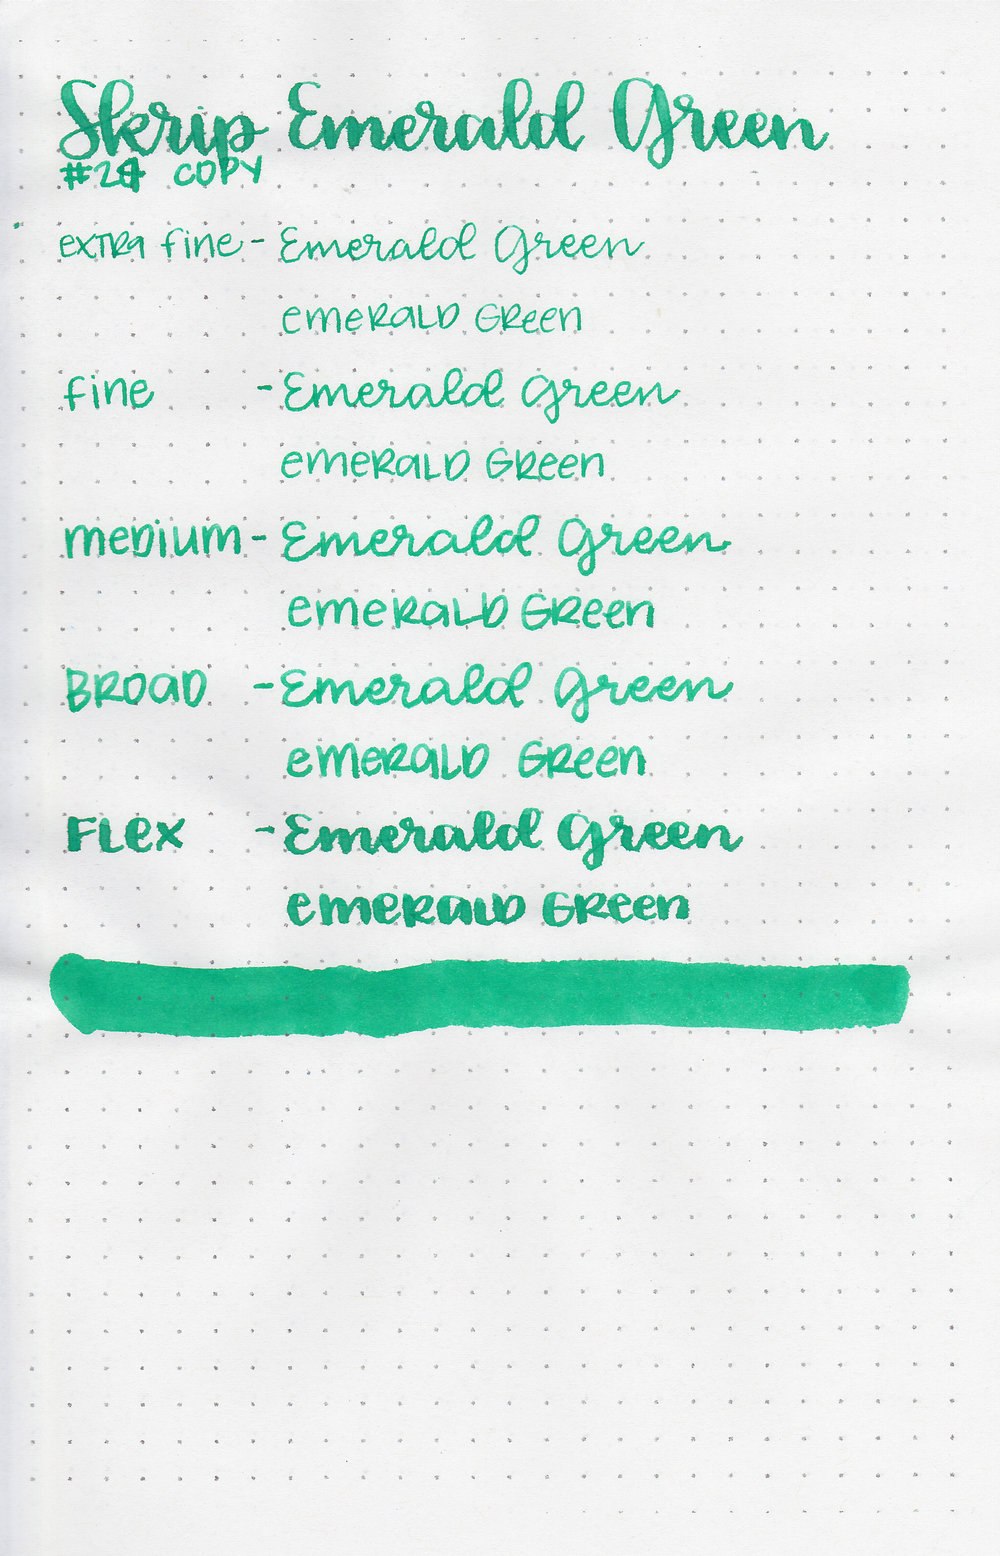 skr-emerald-green-15.jpg